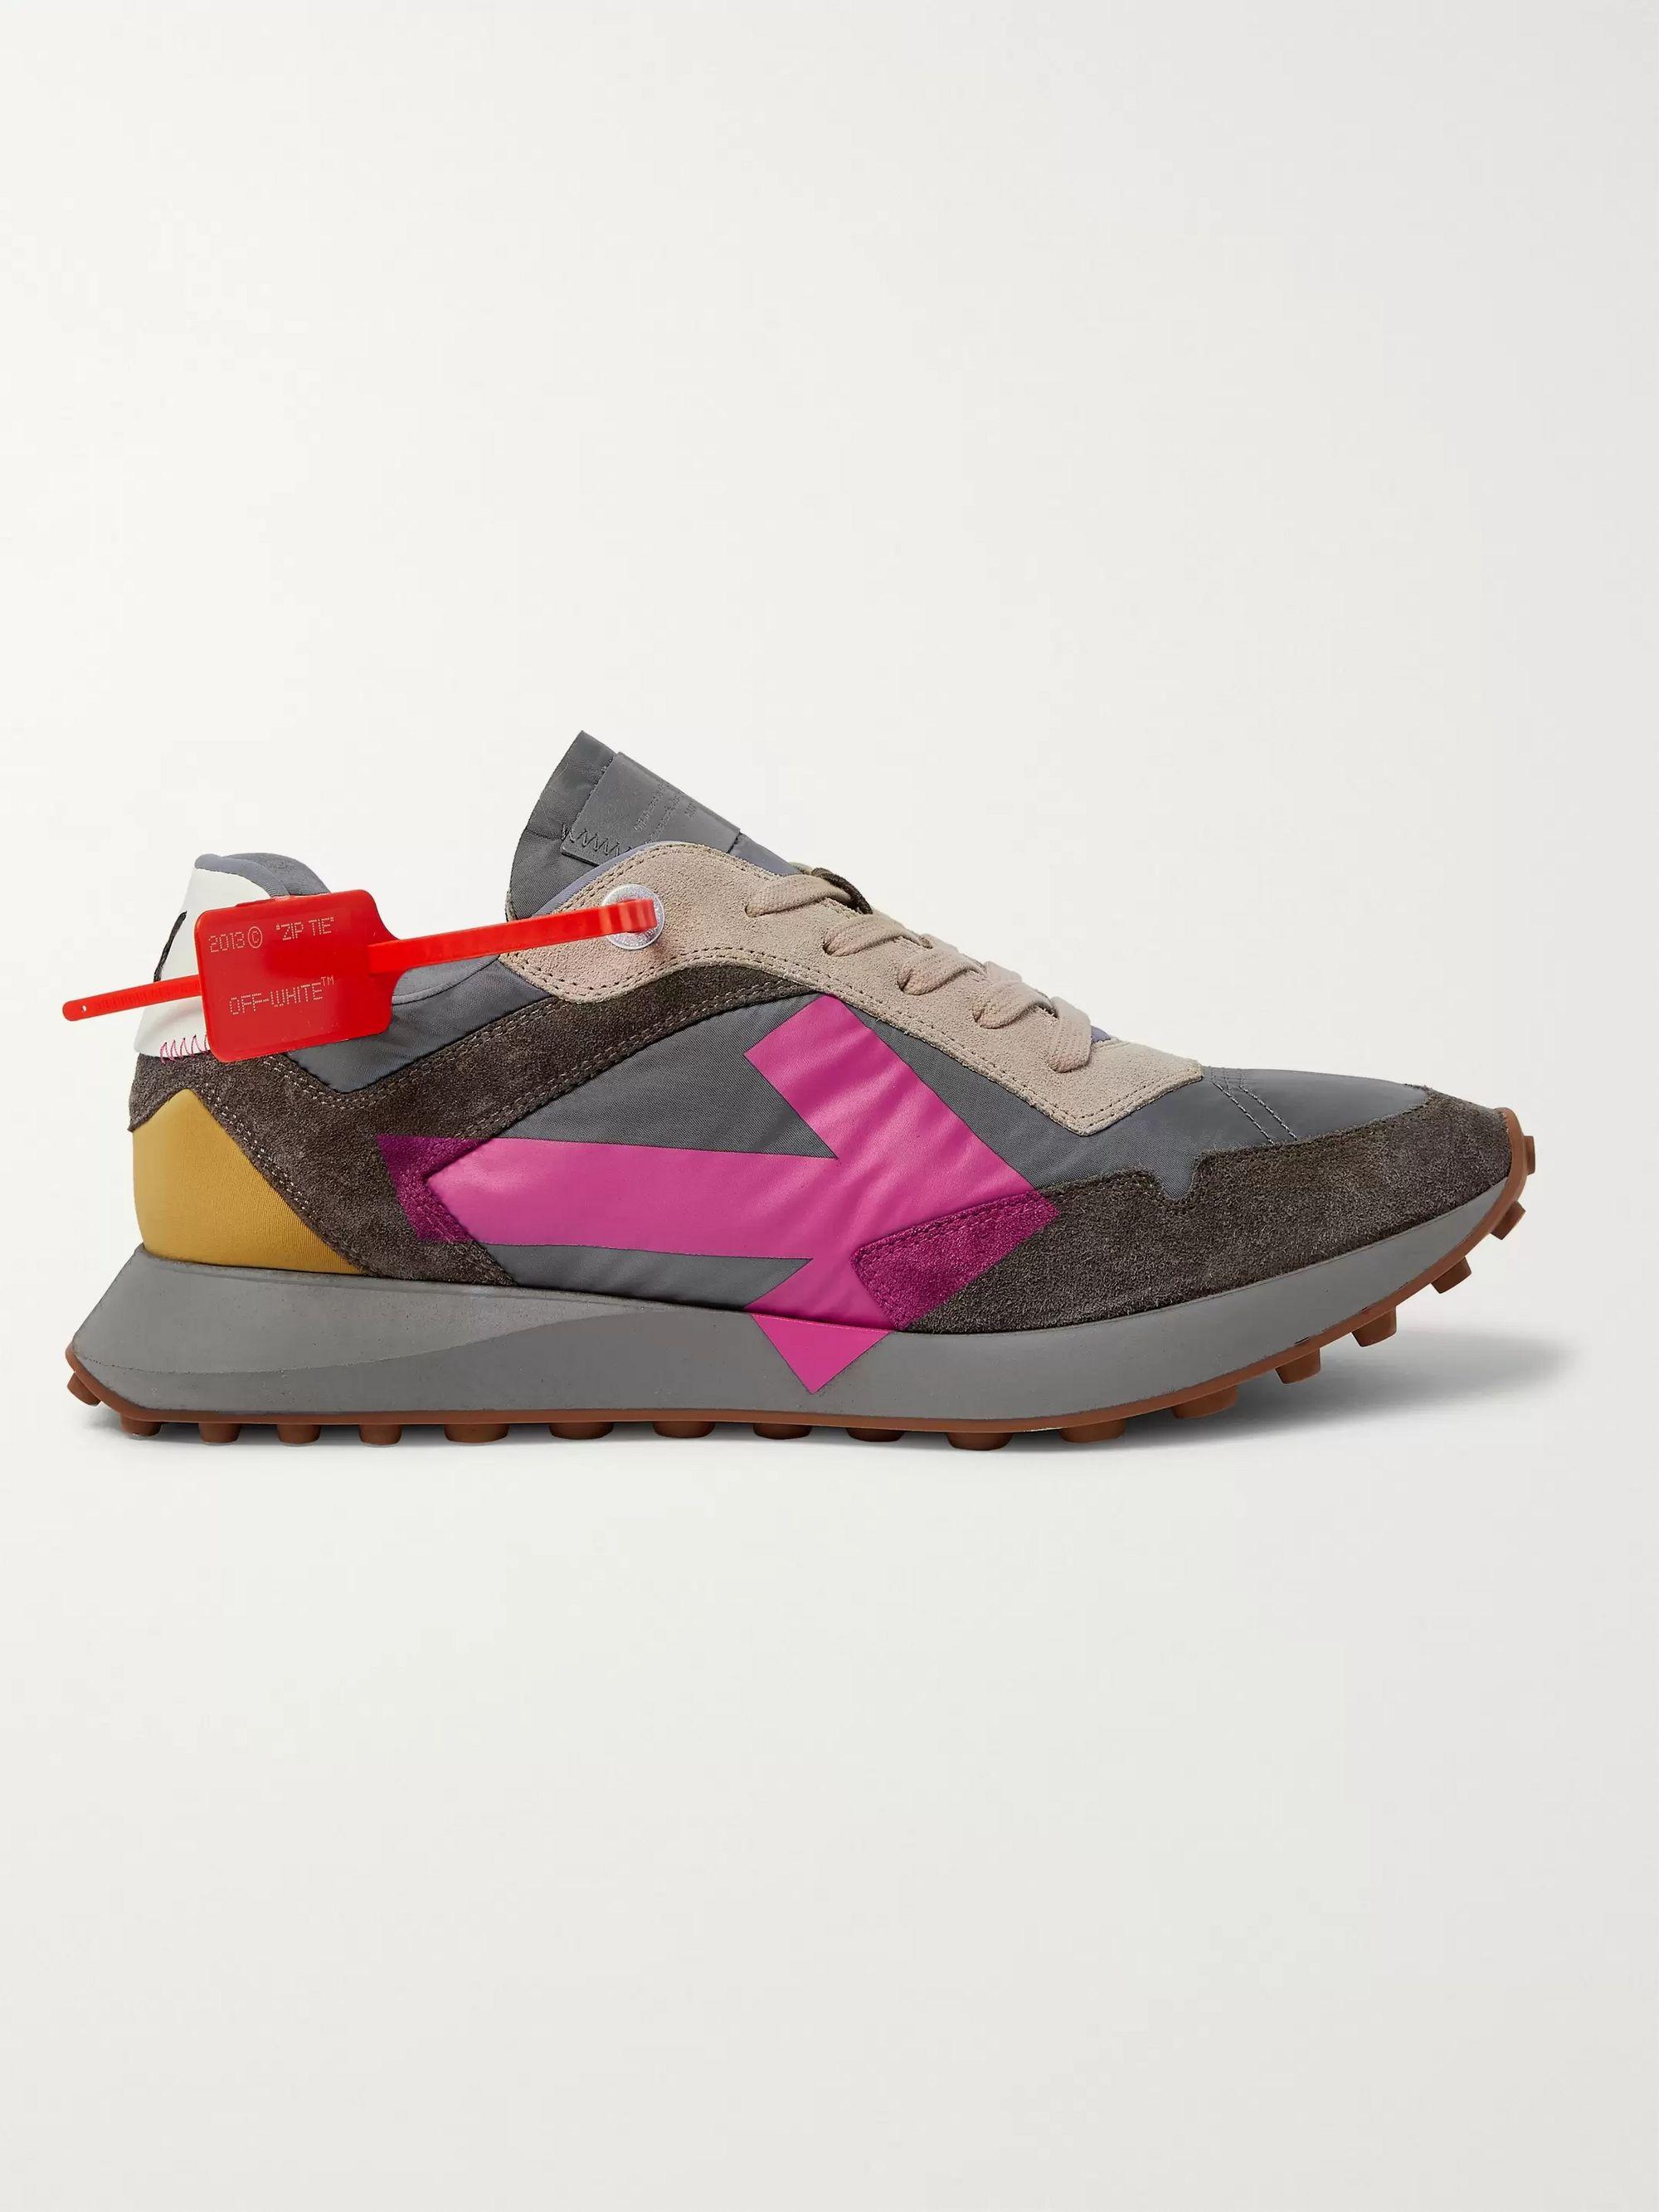 3733 low top sneakers